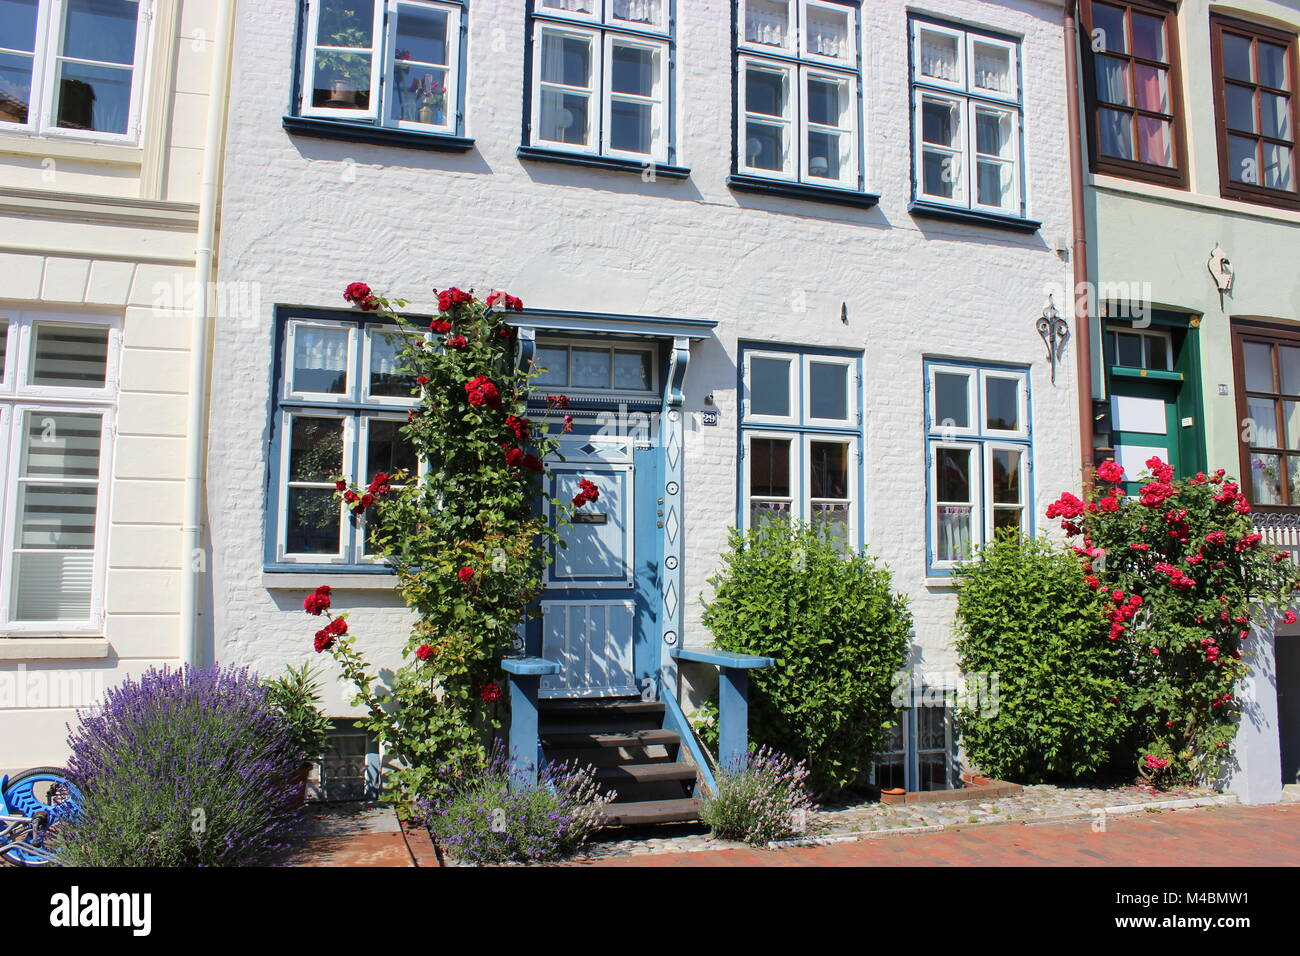 Glueckstadt idyll - Stock Image